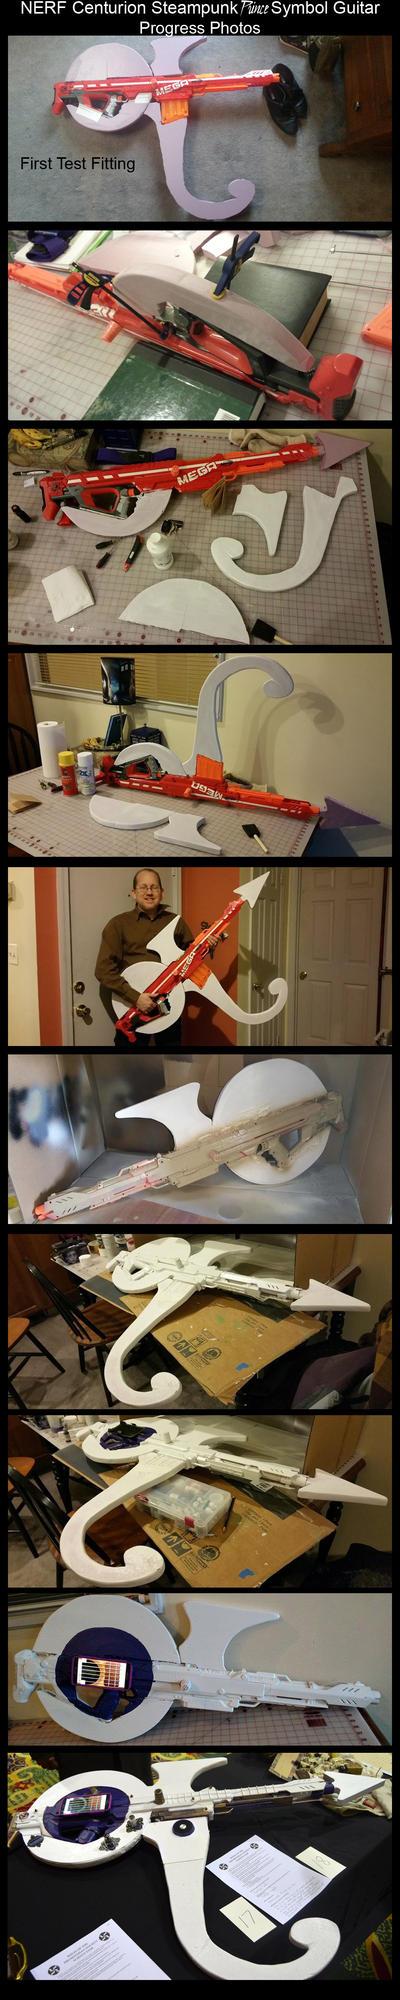 NERF Centurion Prince Guitar WIP by CaelynTek